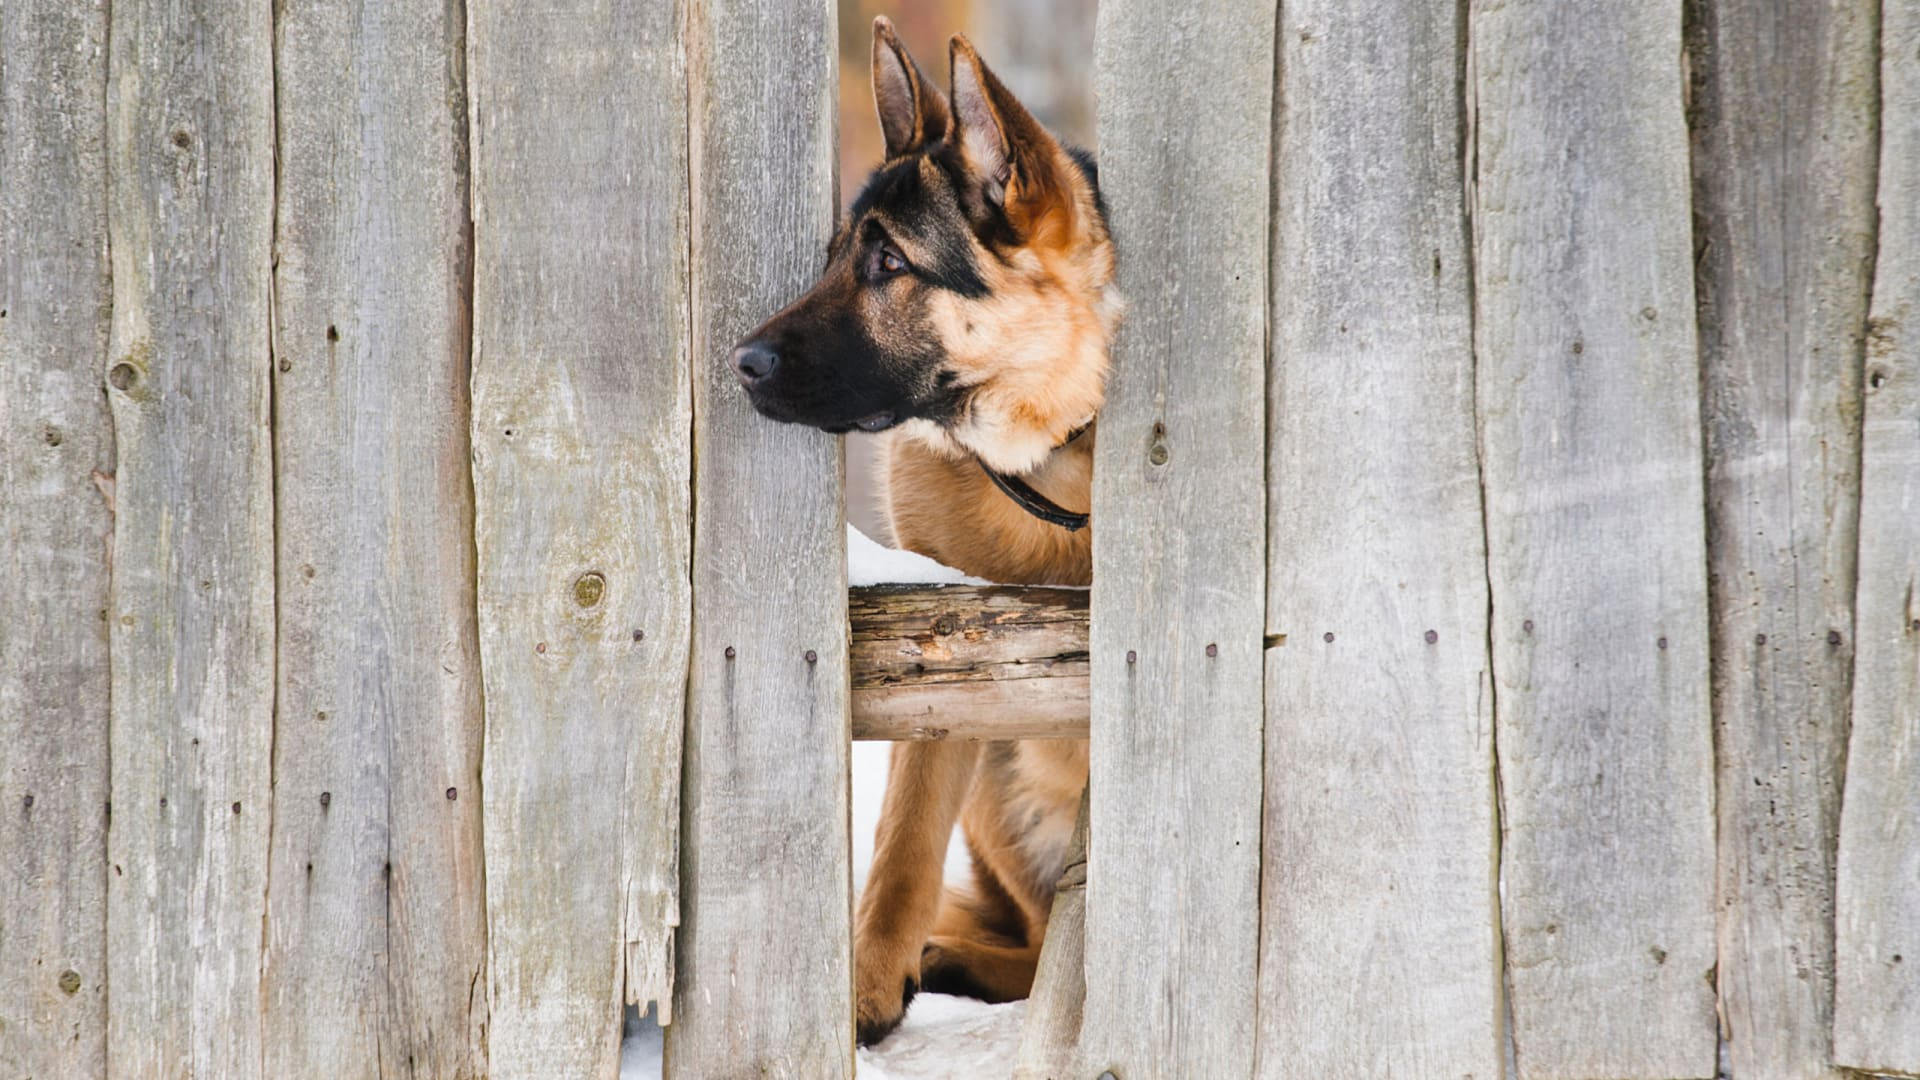 Best Wireless Dog Fence for German Shepherds